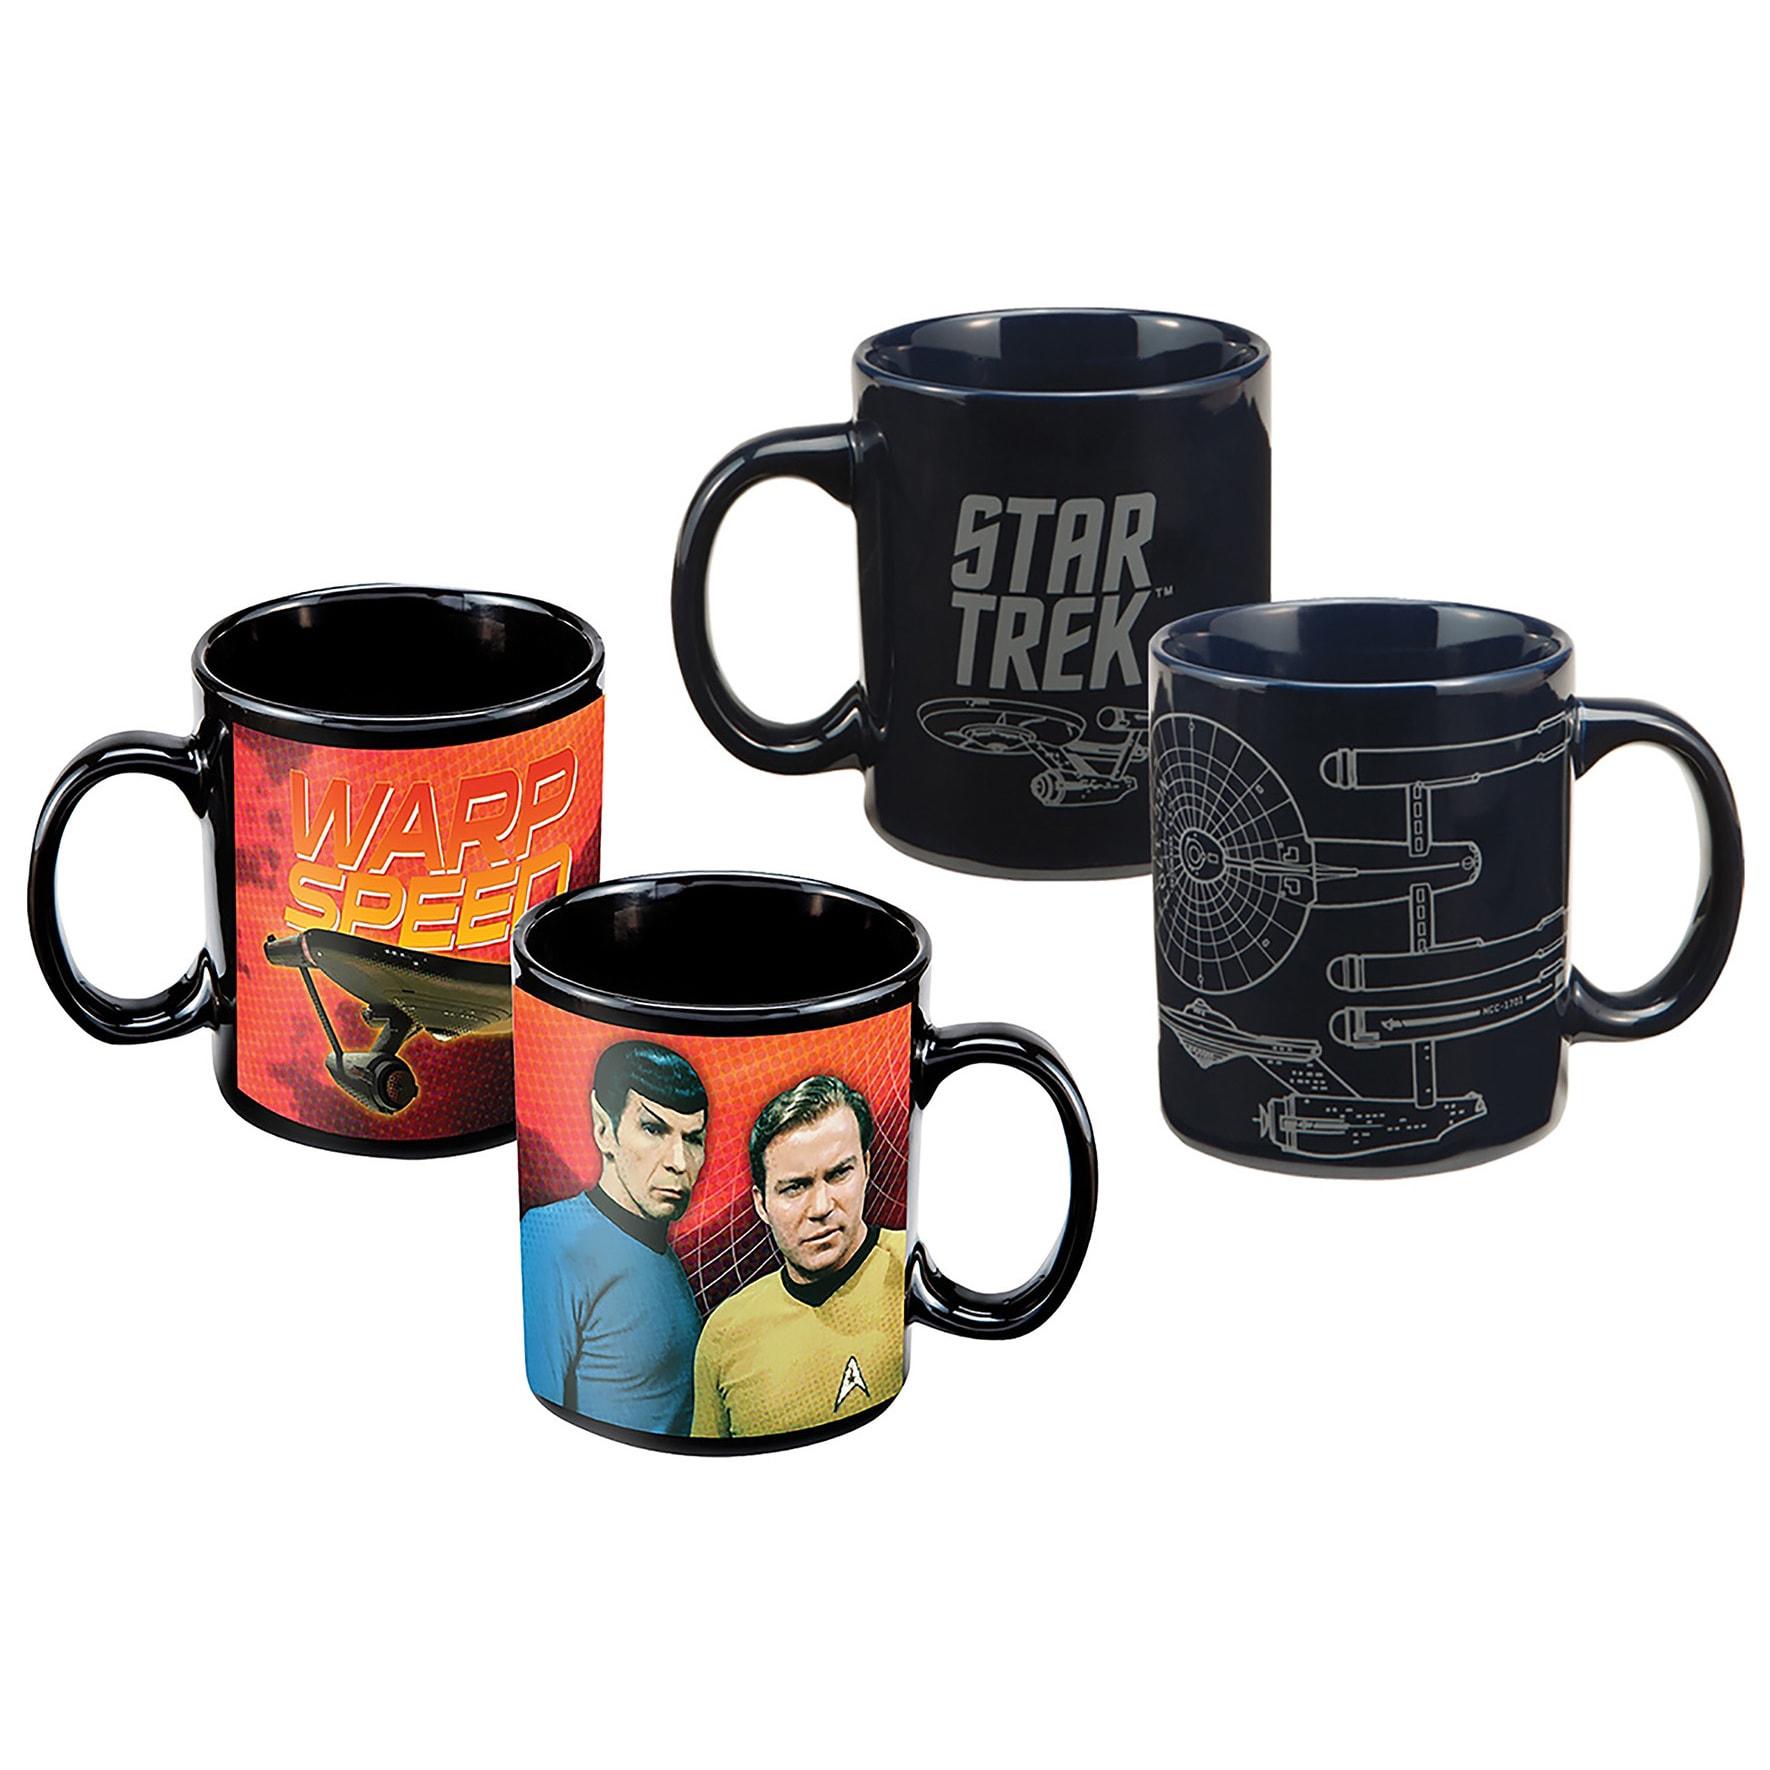 Star Trek Movie Coffee Mug Collection (2 Pack) (2-Pack St...